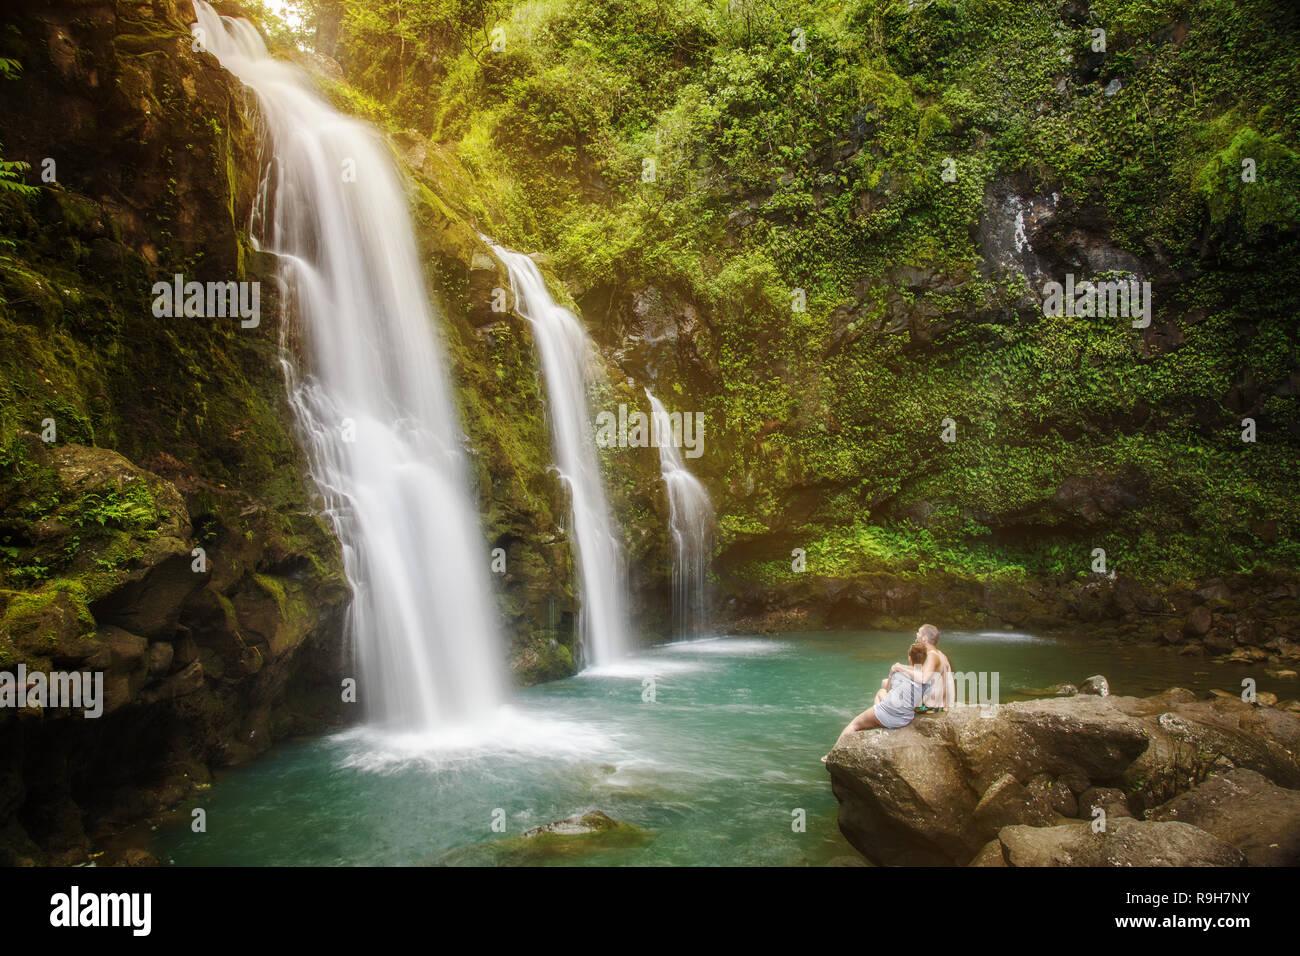 Upper Waikani Falls Hawaii couple in love romantic getaway - Stock Image